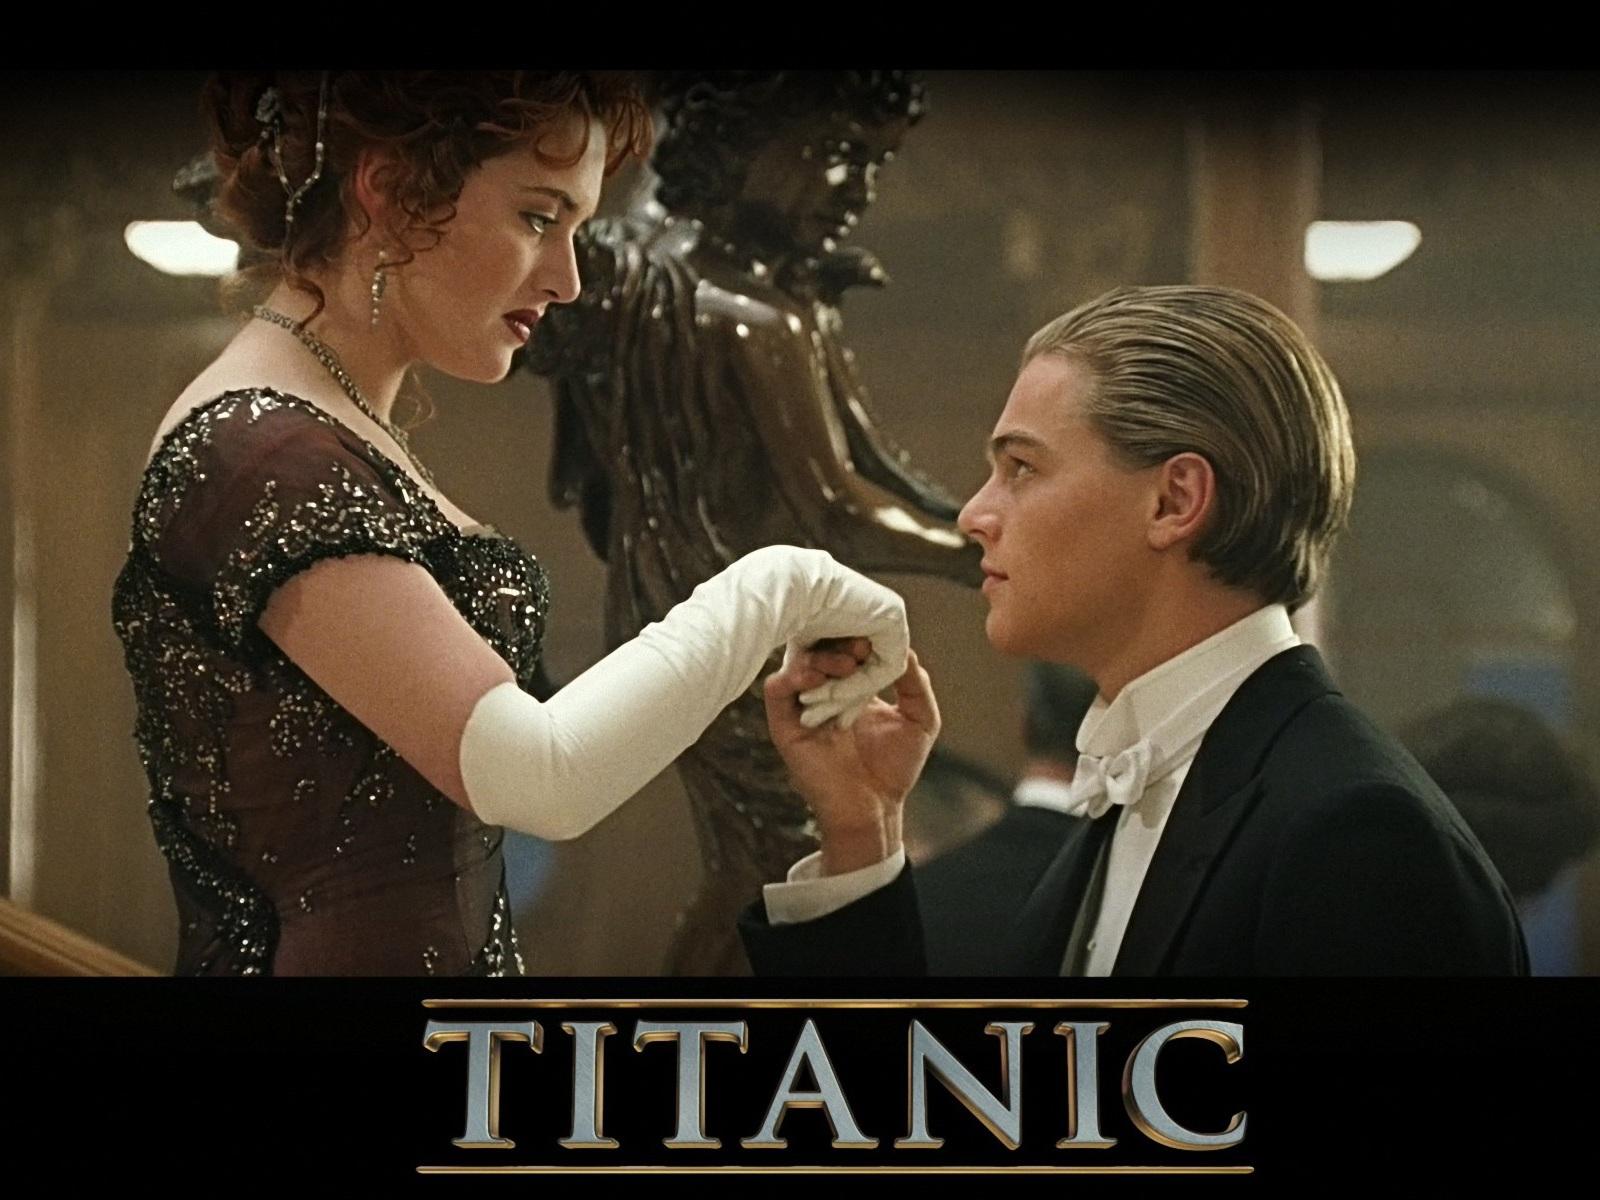 Titanic 3D Poster 1600x1200 Wallpapers, 1600x1200 ...